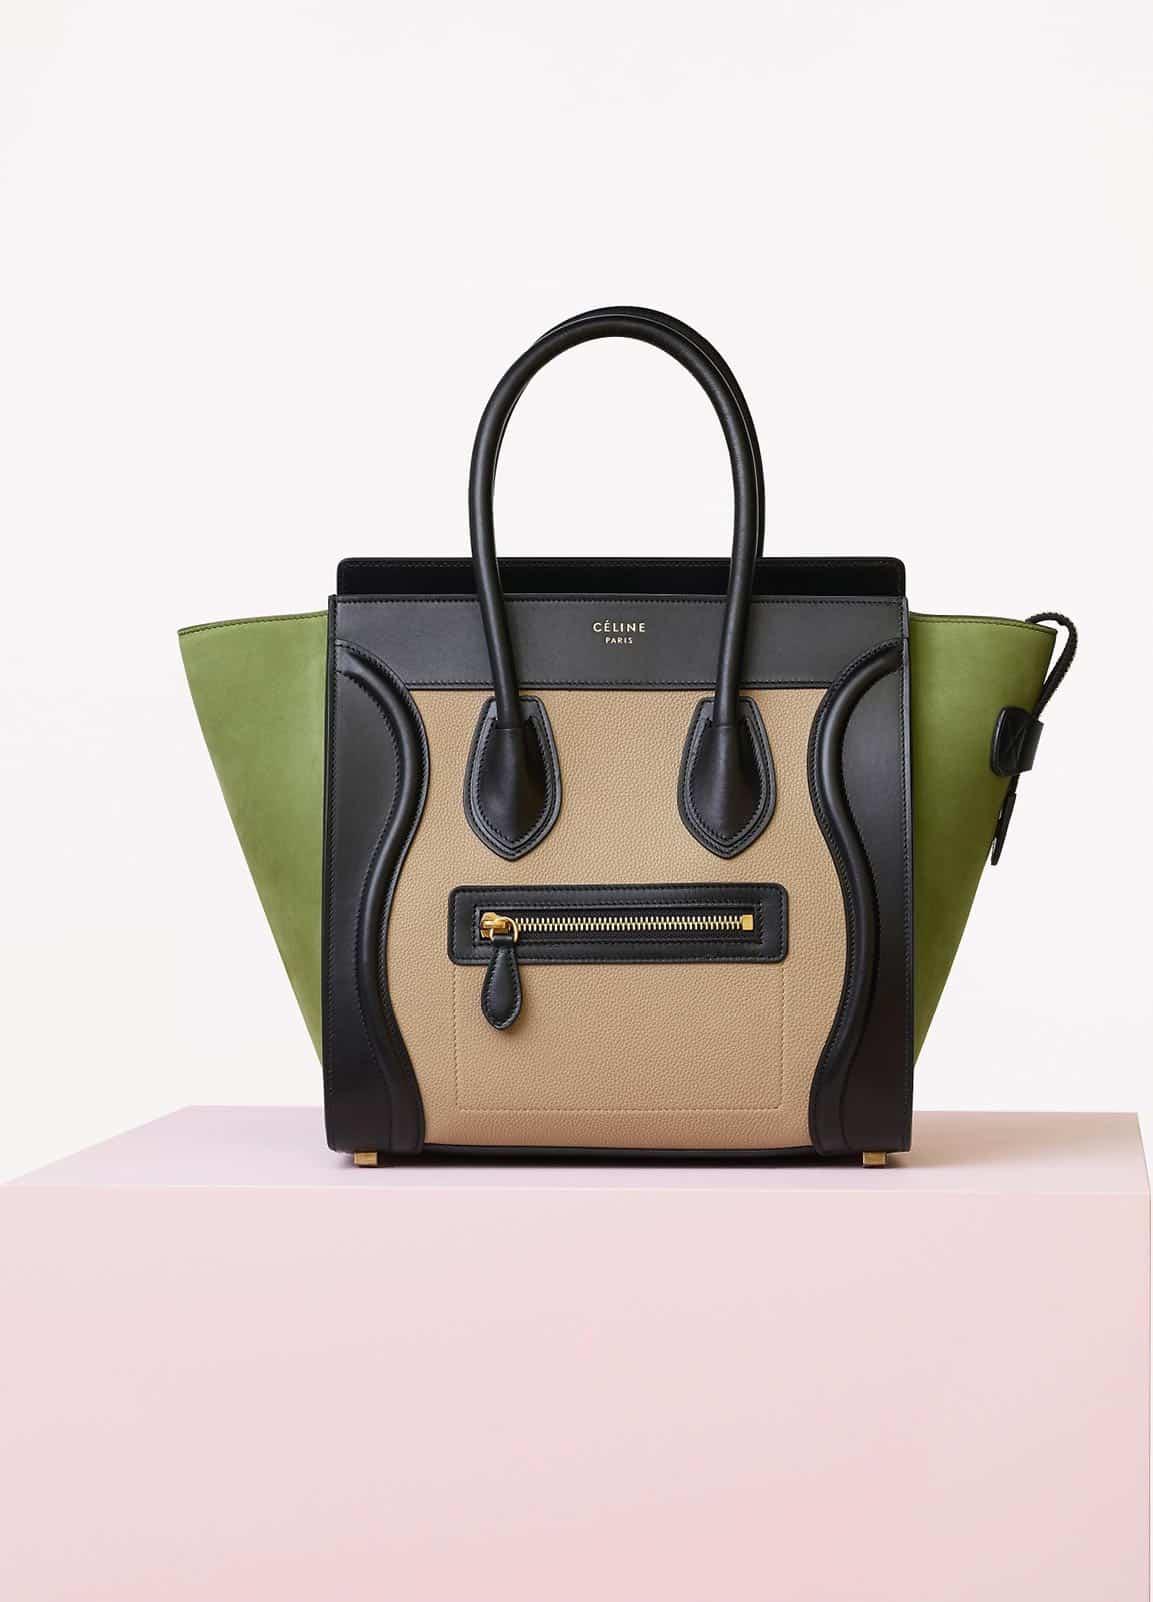 Borse Bag Treviso : Celine borse in saldo bags review